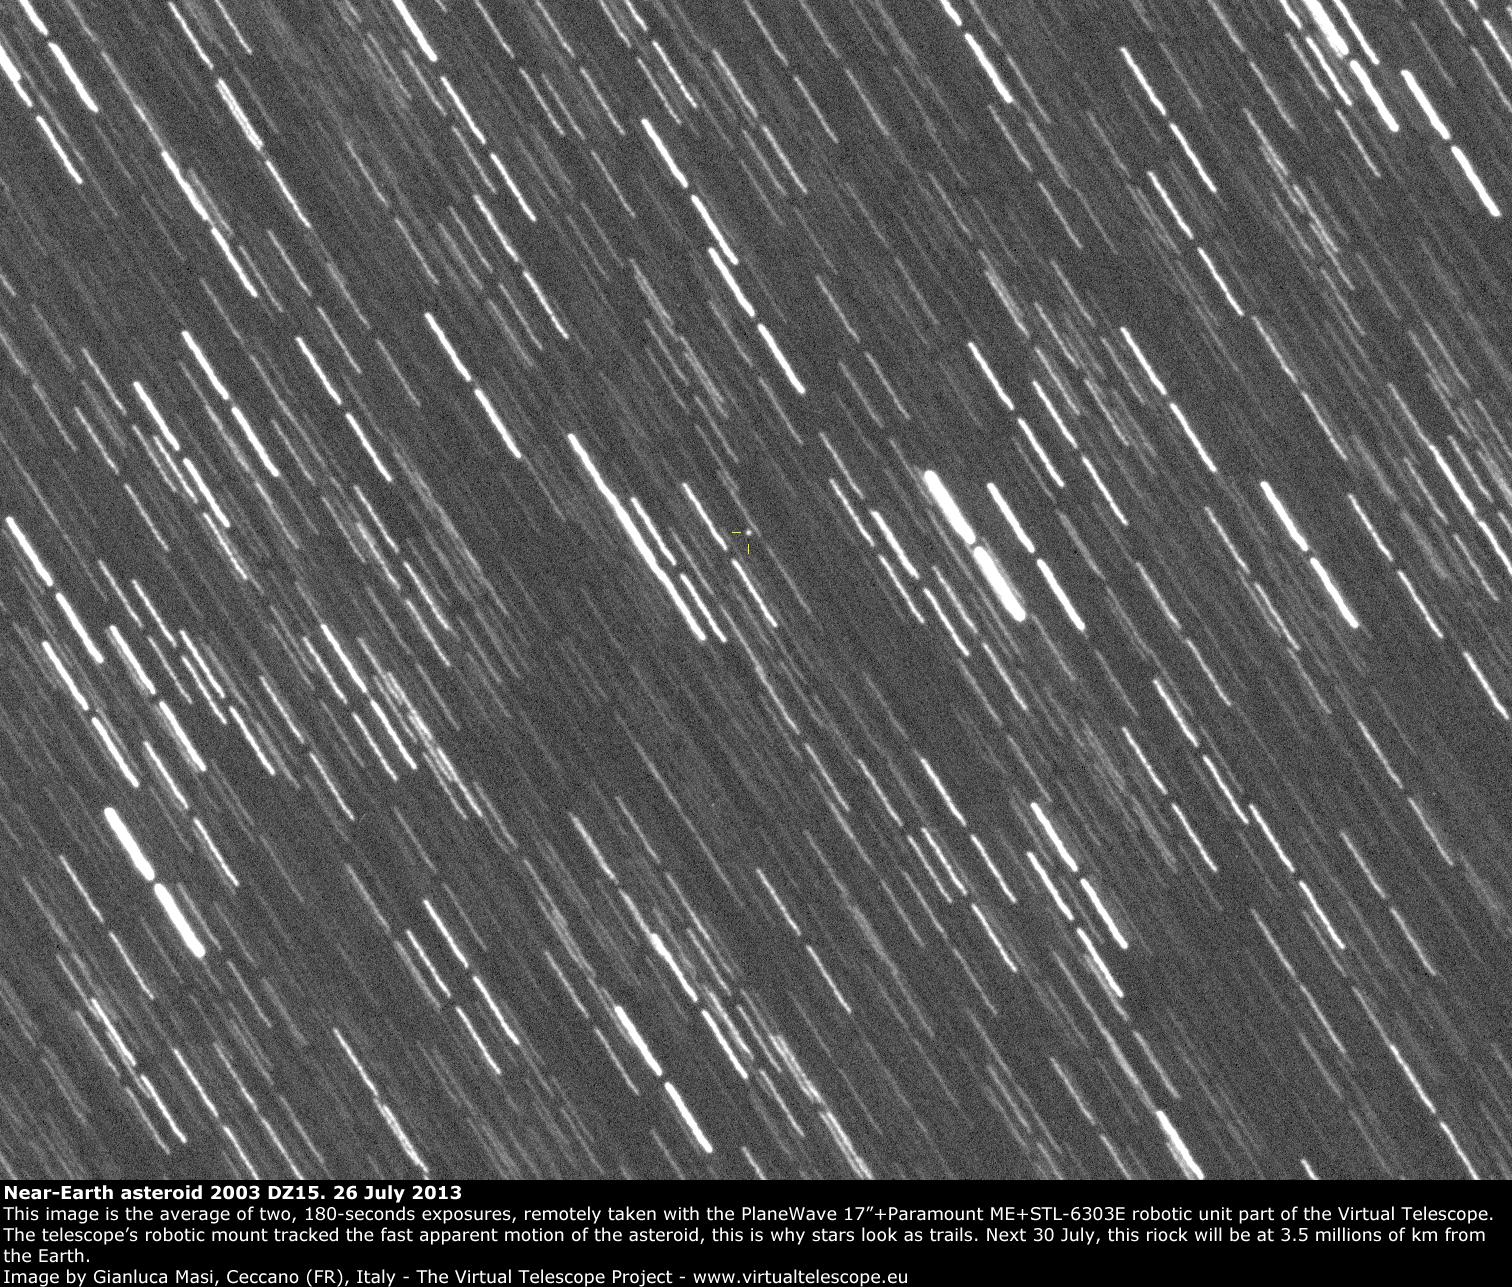 Near-Earth Asteroid 2003 DZ15: 26 July 2013